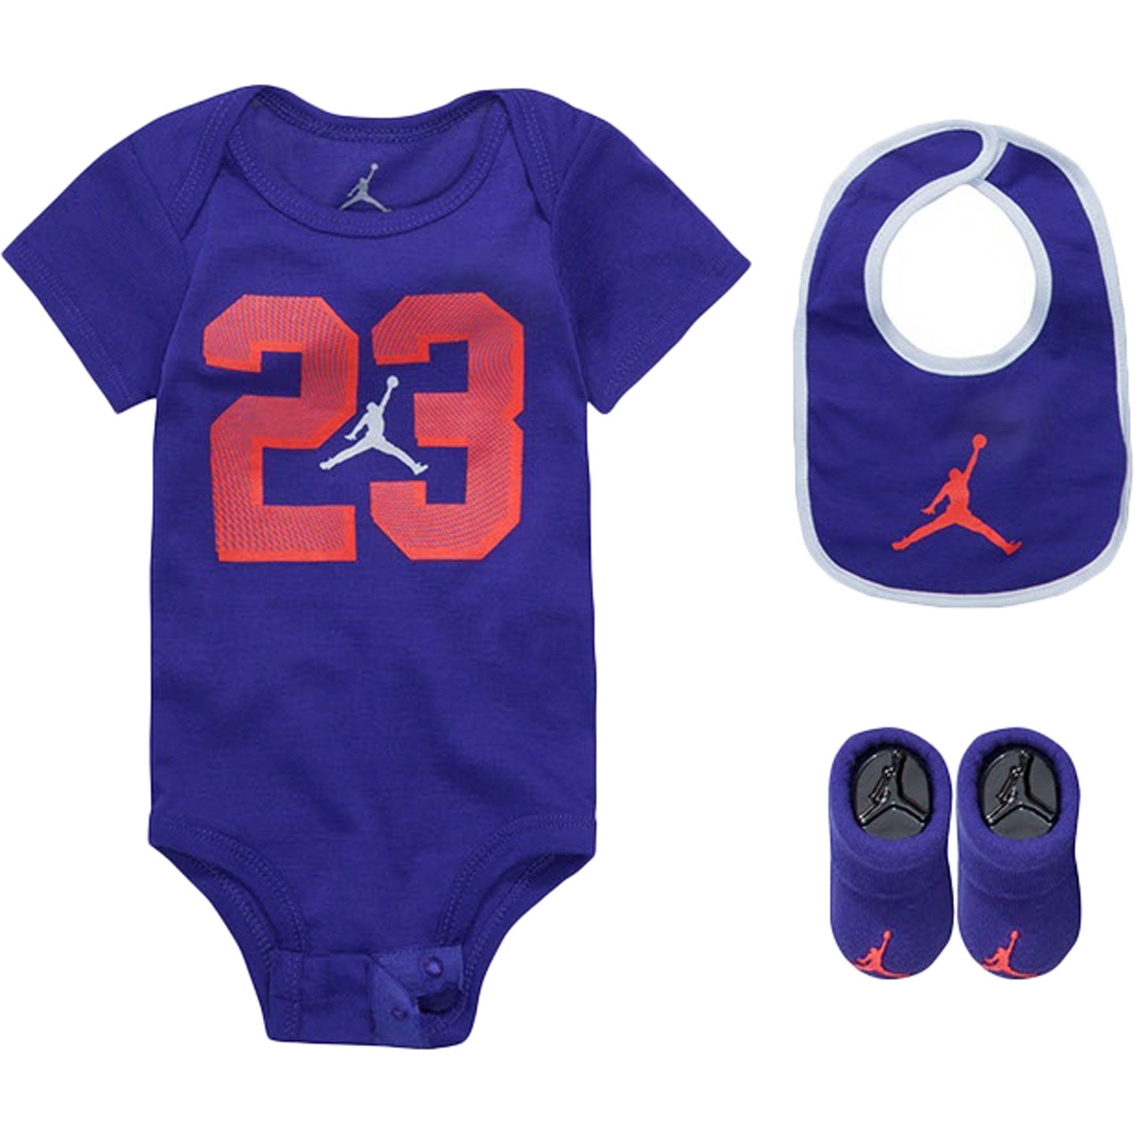 de597299b Jordan Infant Girls 23 Flow 3 Pc. Bodysuit Set | Baby Girl 0-24 ...